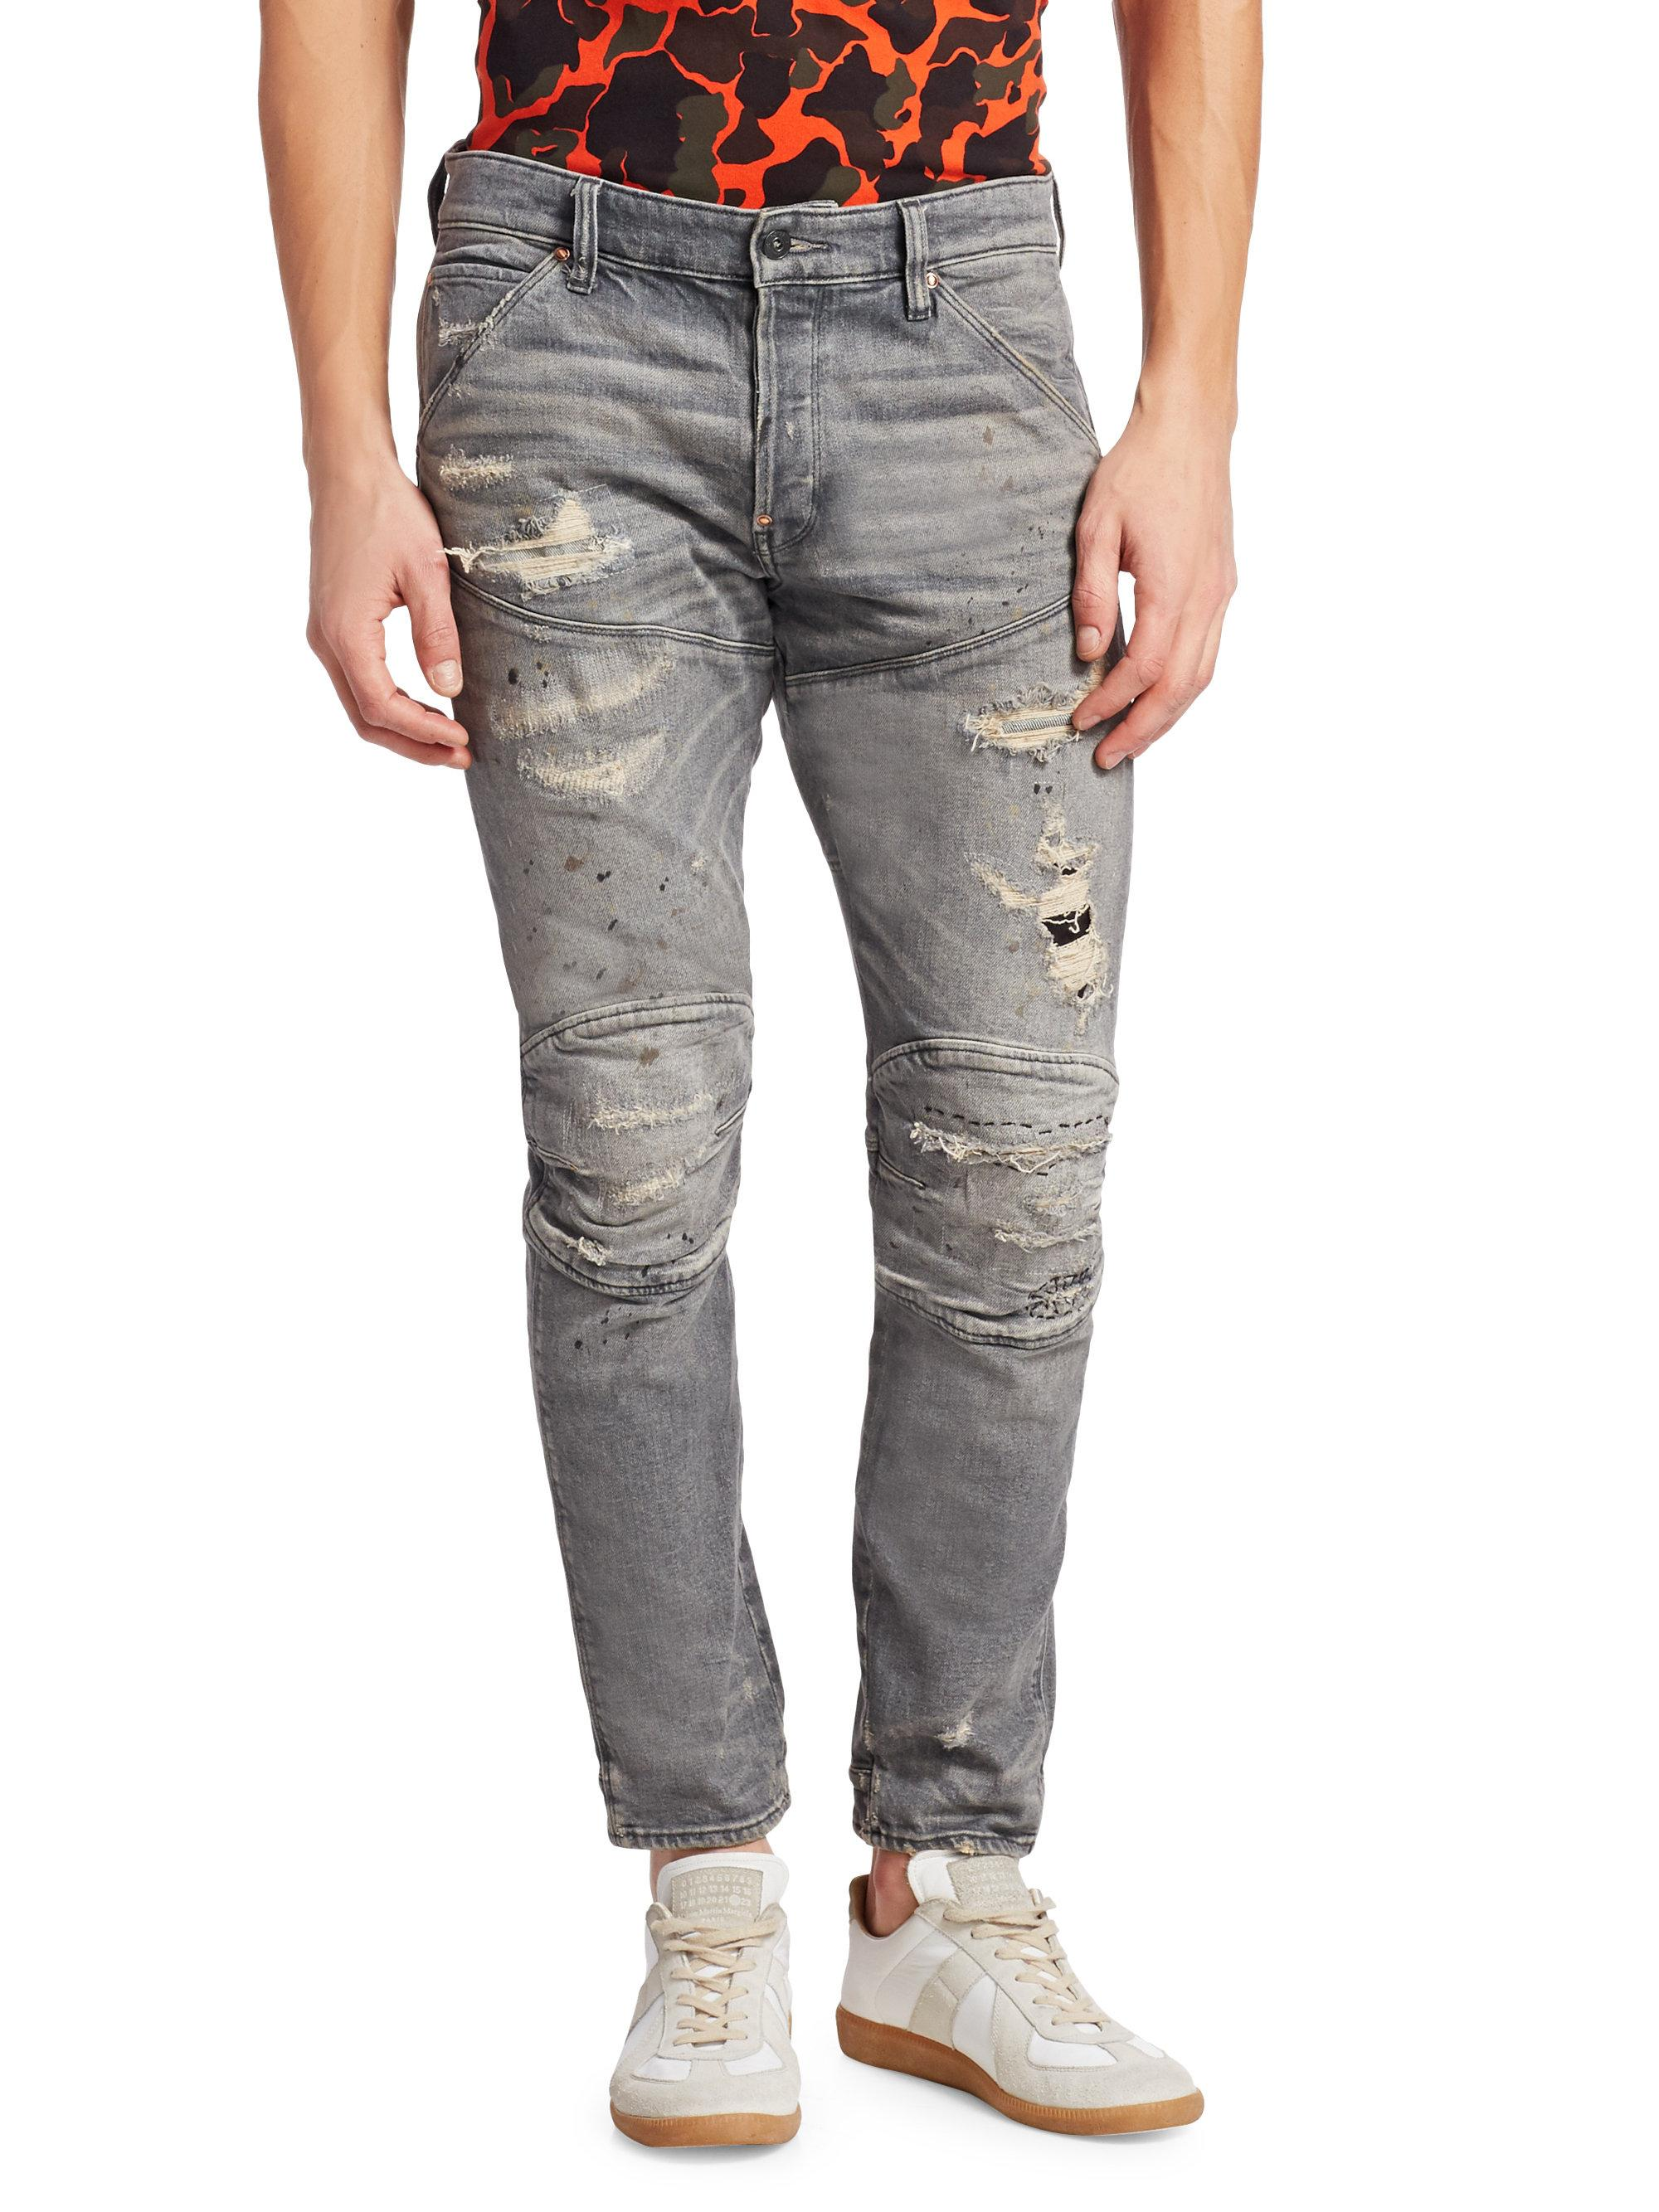 G-Star RAW. Men\u0027s Gray 5620 3d Ripped Tapered Slim-fit Jeans